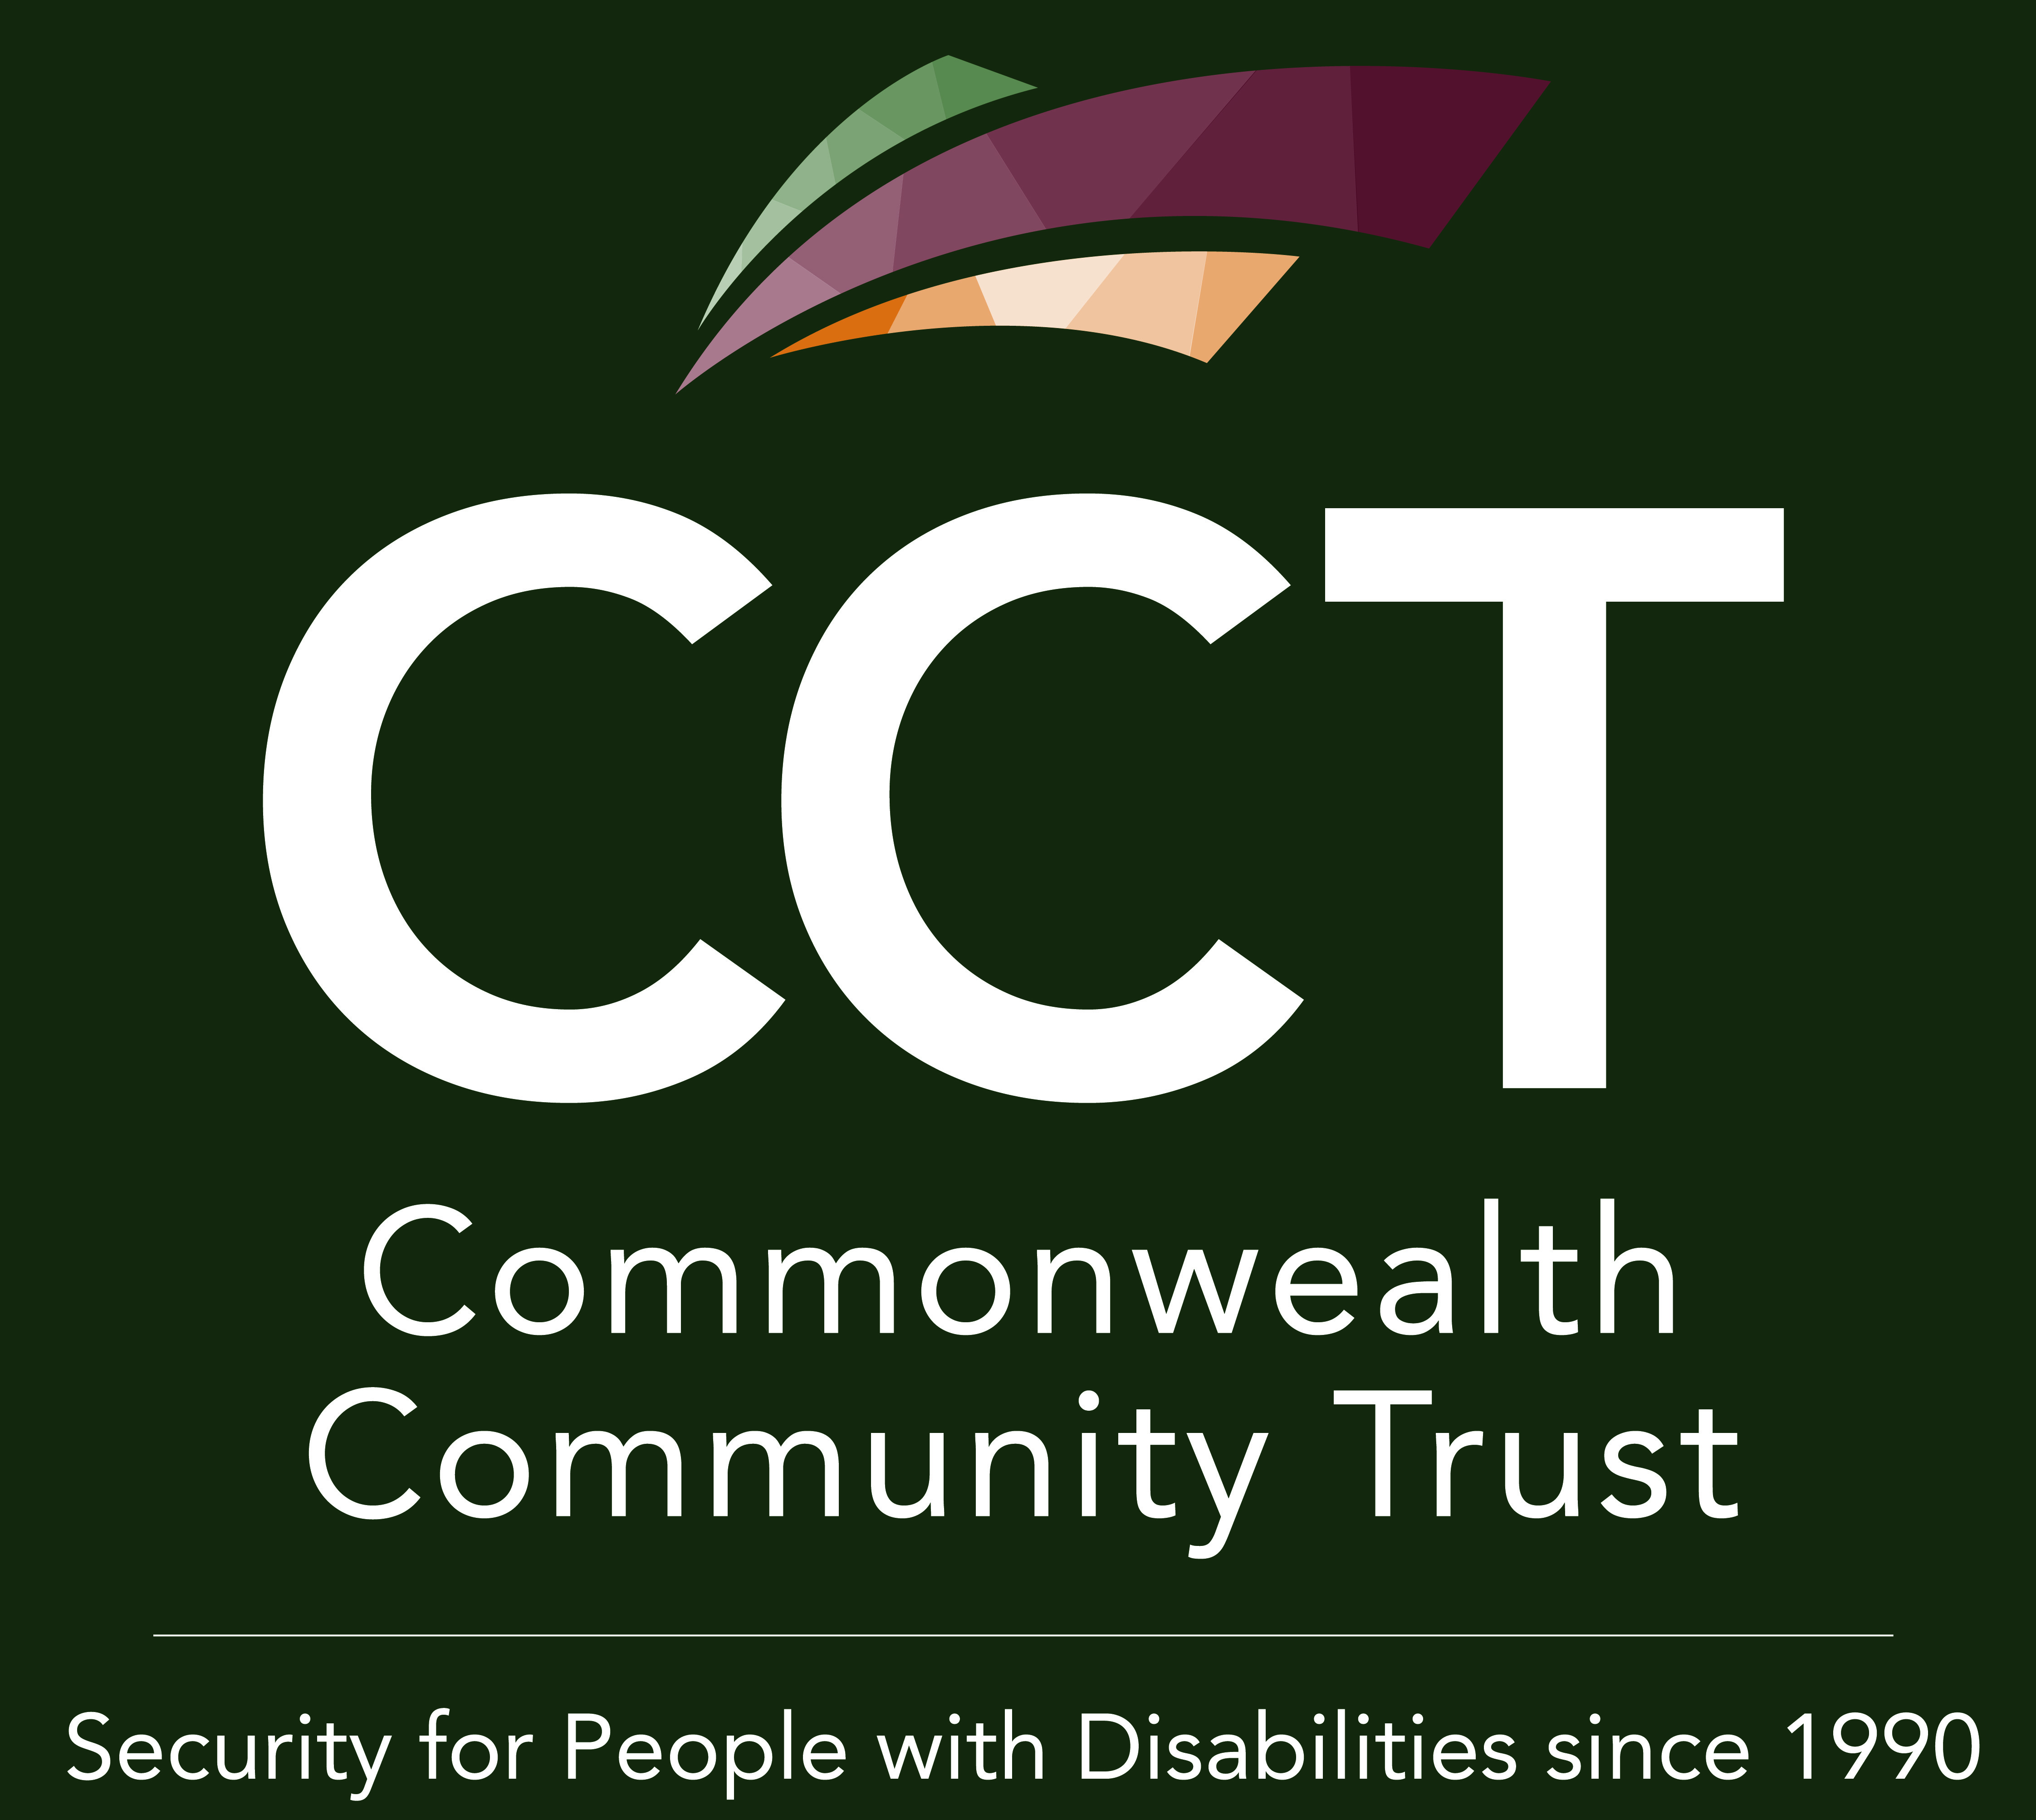 media/web-CommonwealthCommunityTrusts-BreakSponsor.jpg